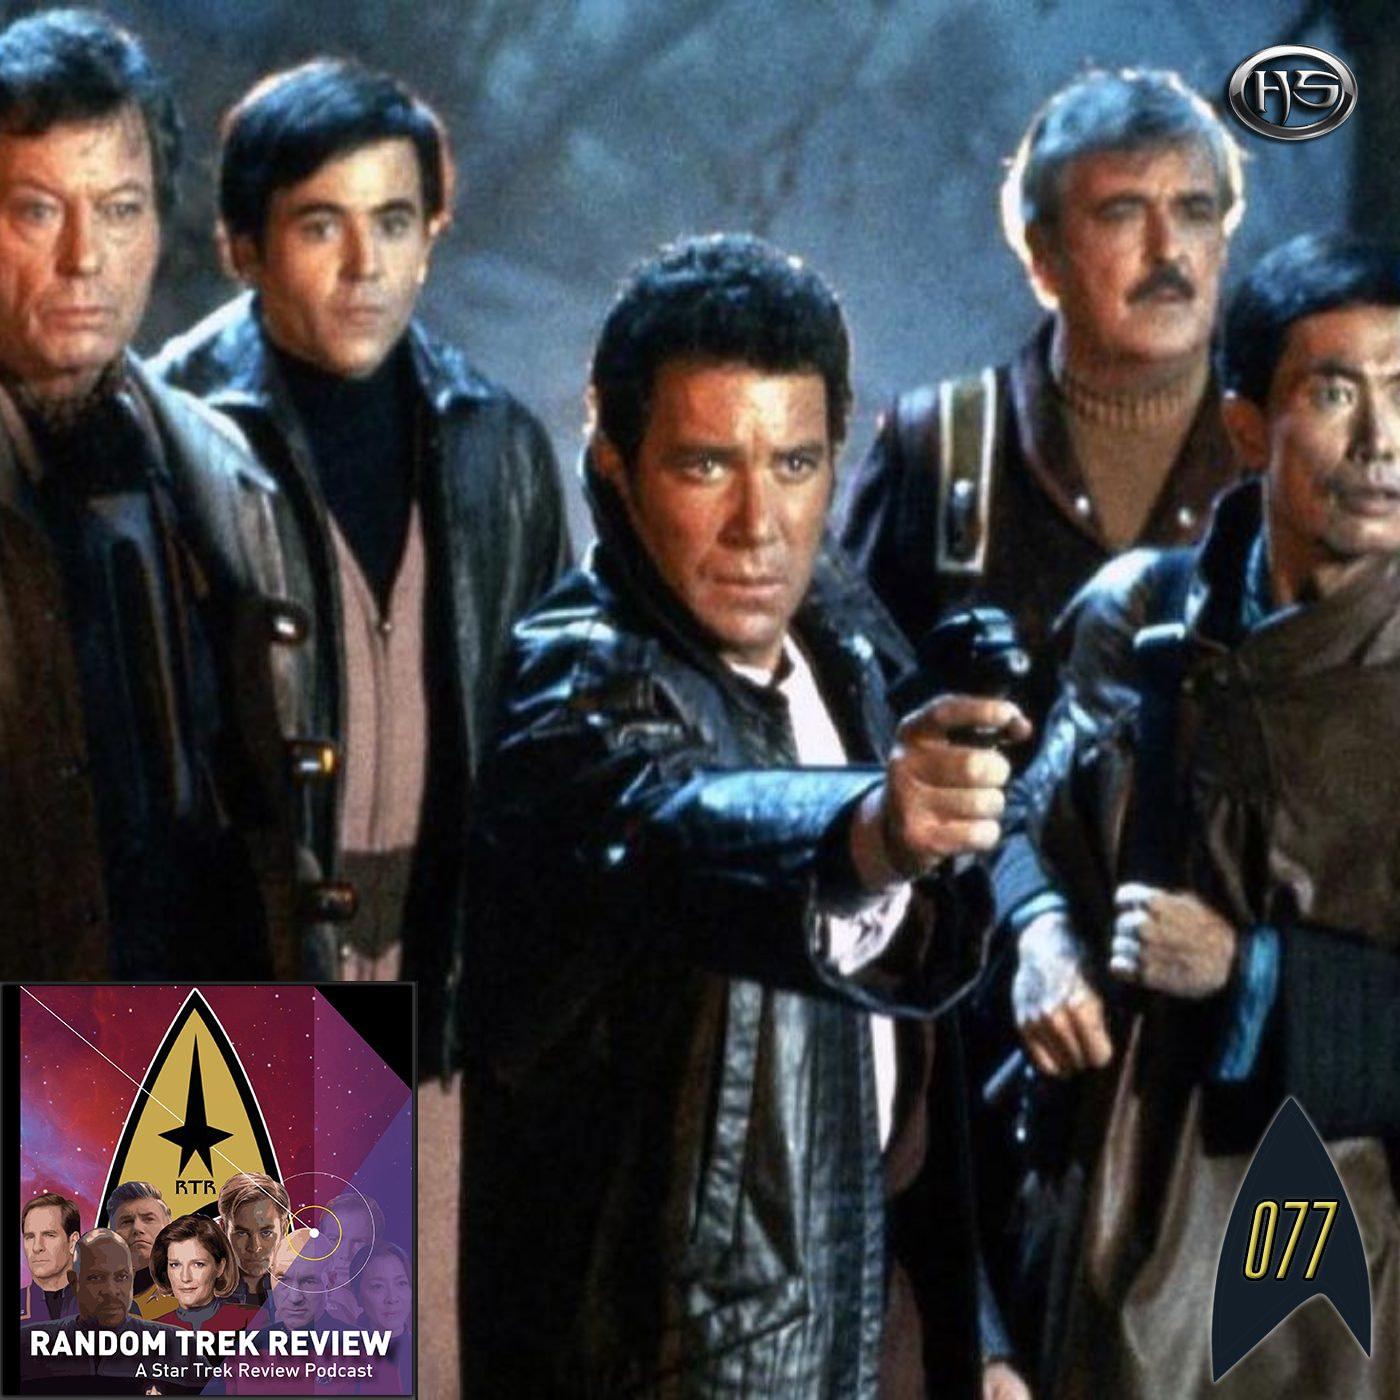 Random Trek Review Episode 77